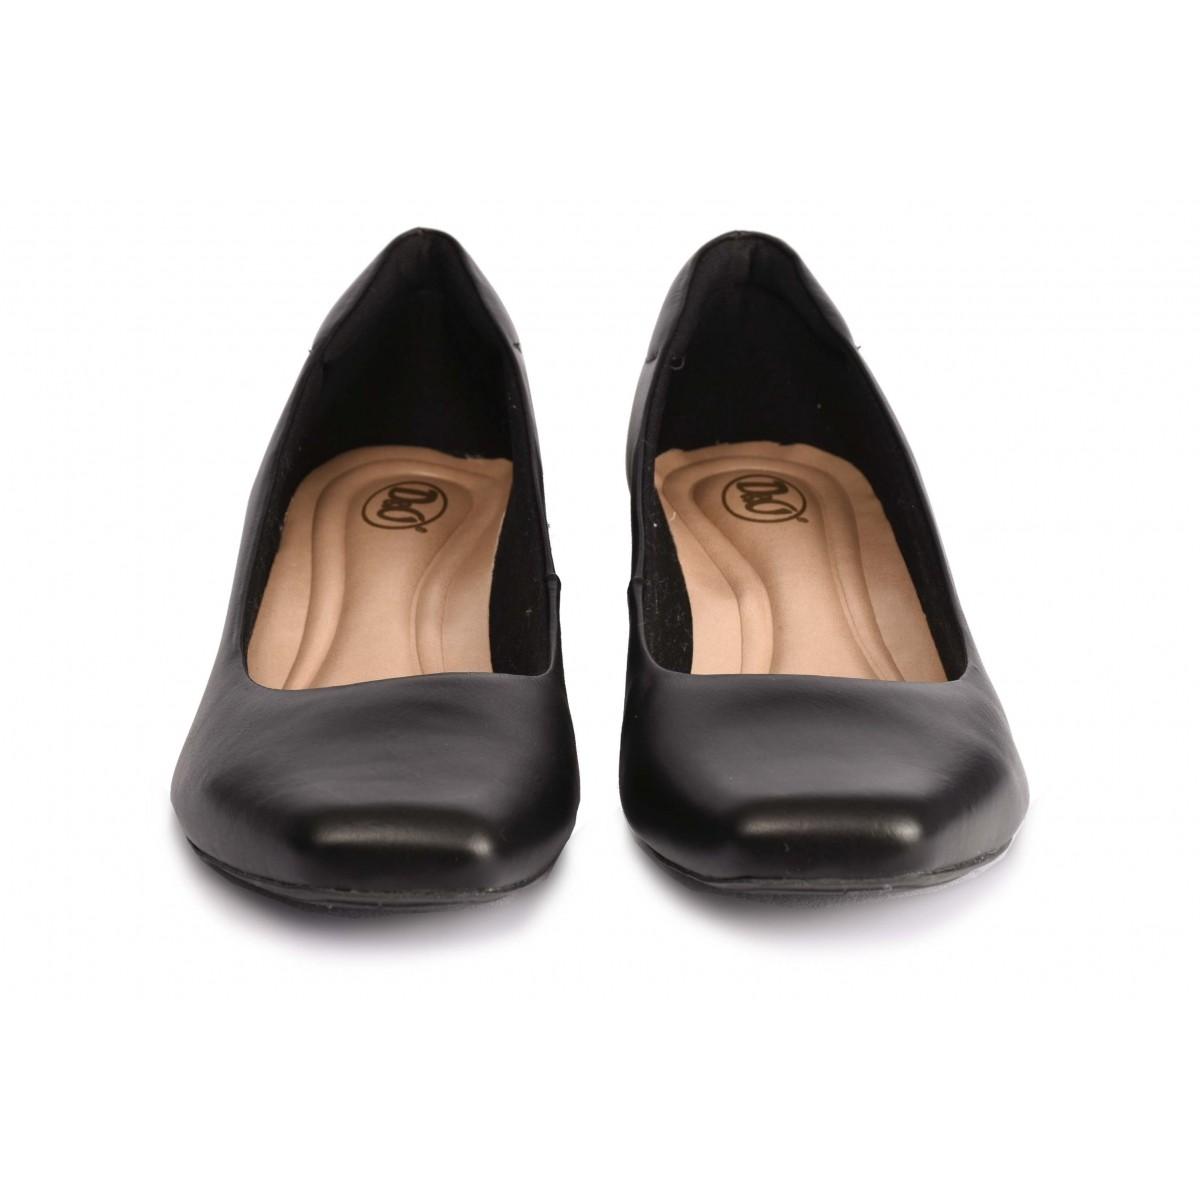 Sapato Neftali Comfort, bico quadrado, preto